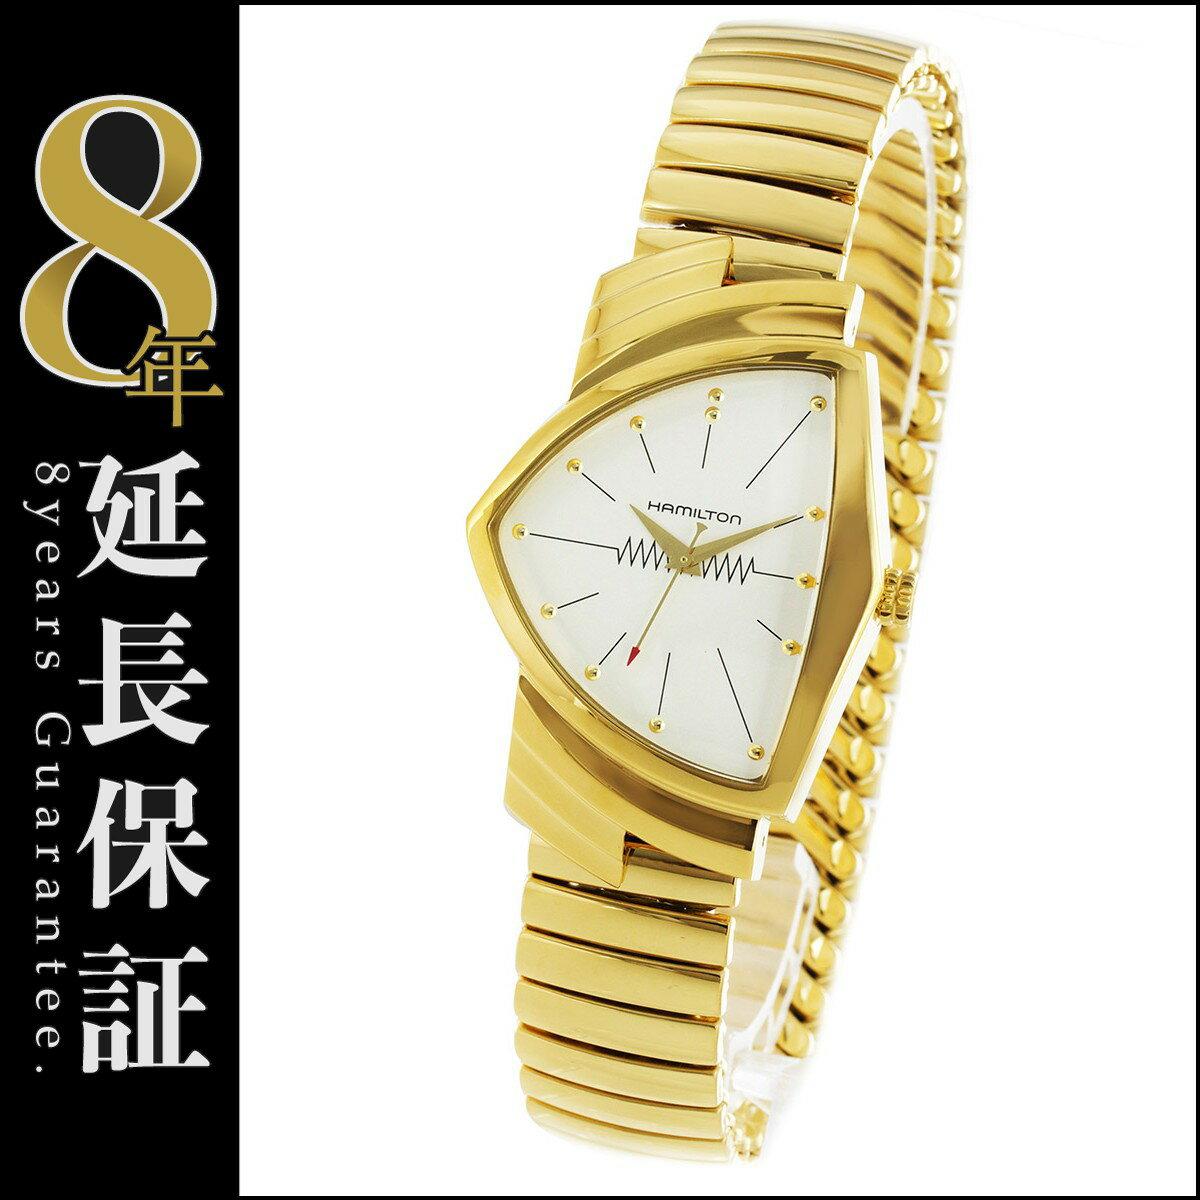 847391007a HAMILTON ハミルトン 腕時計 フレックス メンズ ベンチュラ H24301111_8